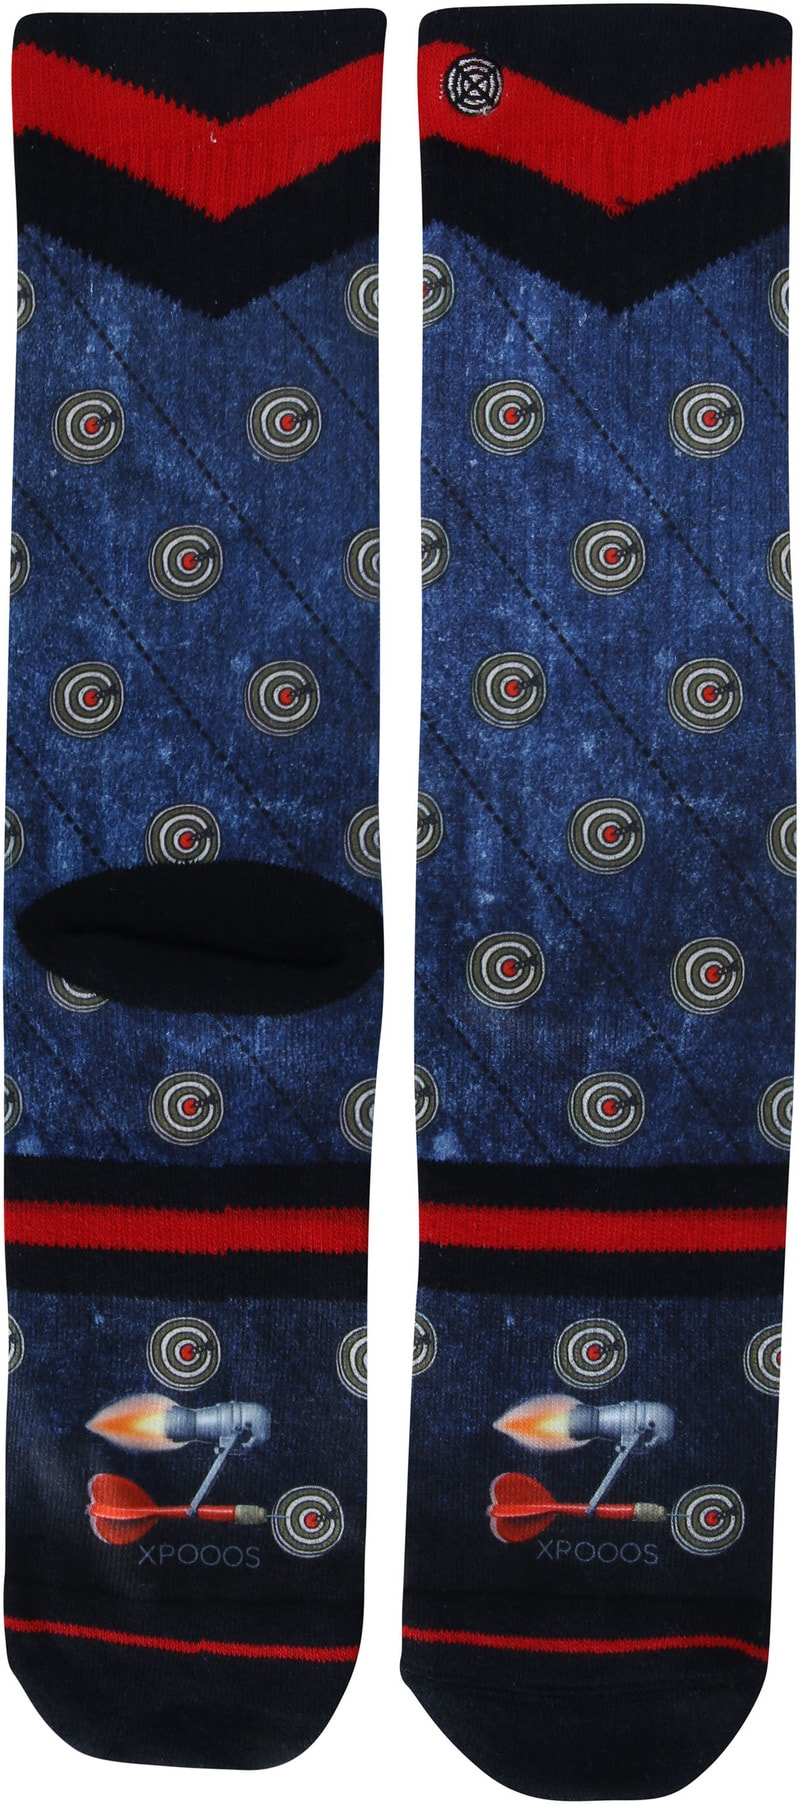 Xpooos Socks Barney photo 1